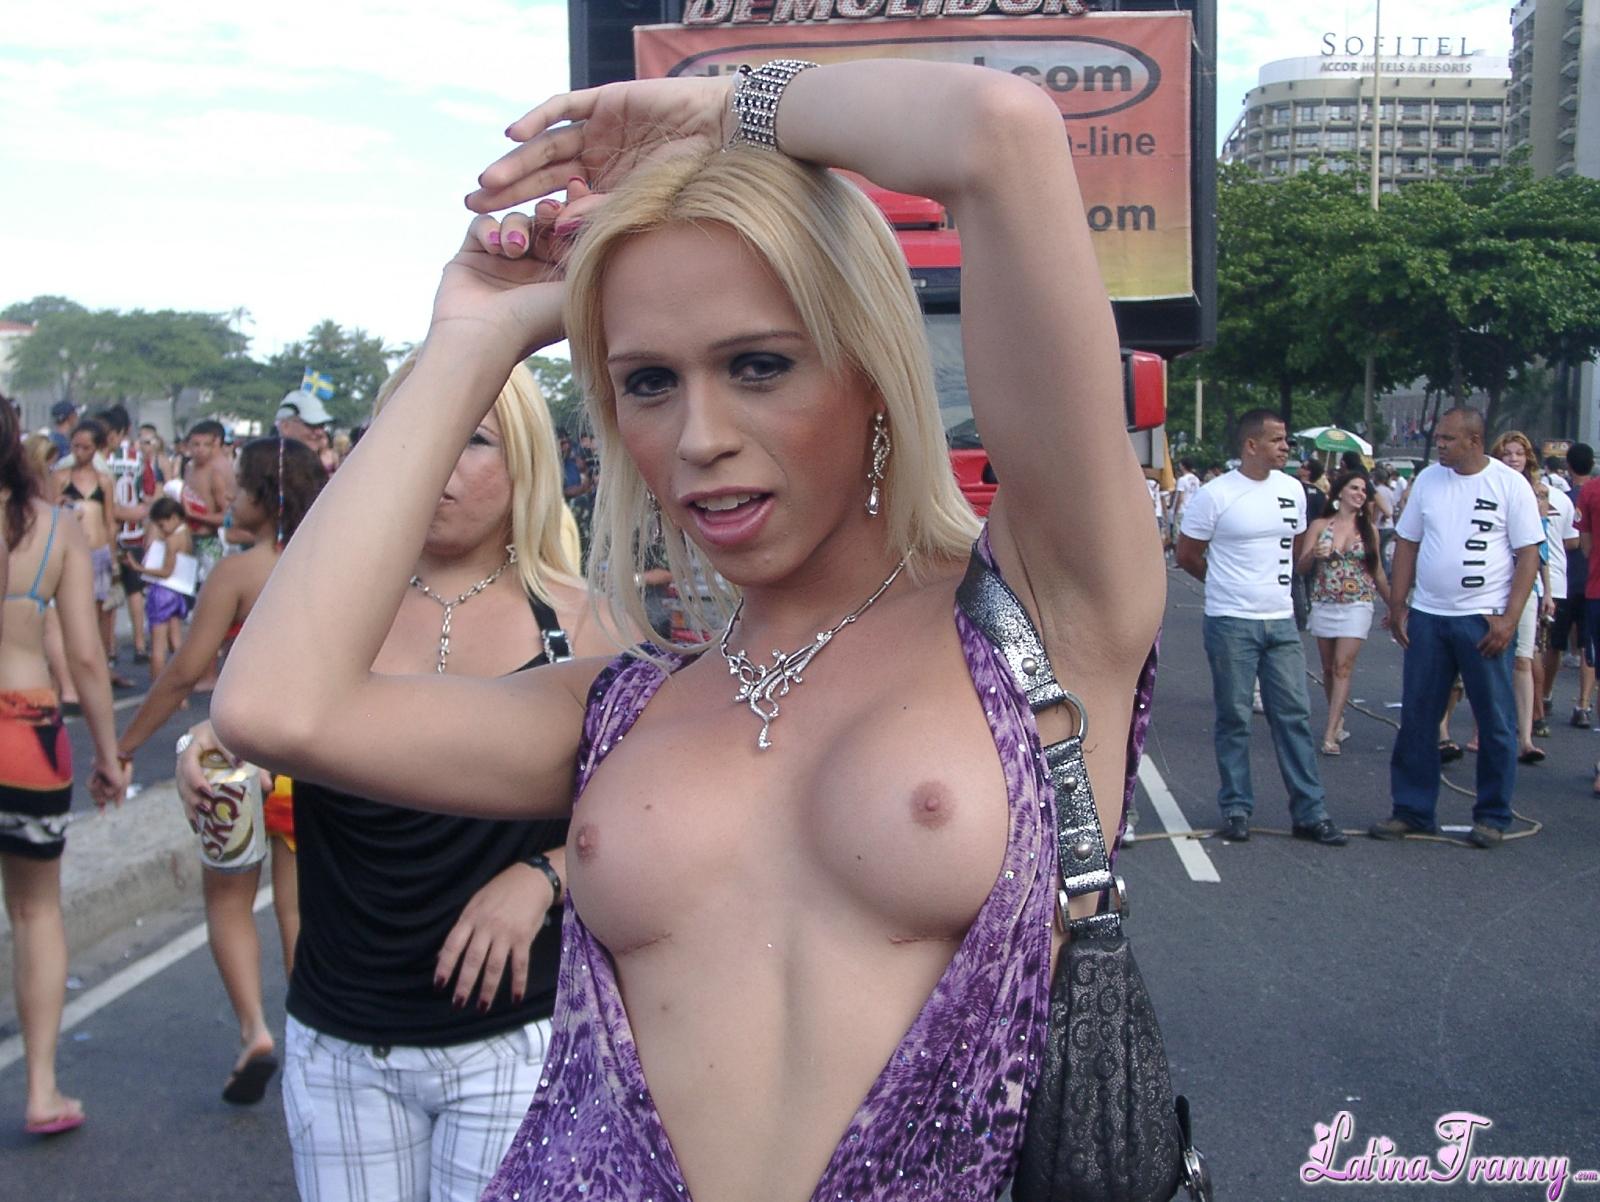 Do women enjoy double penetration sex